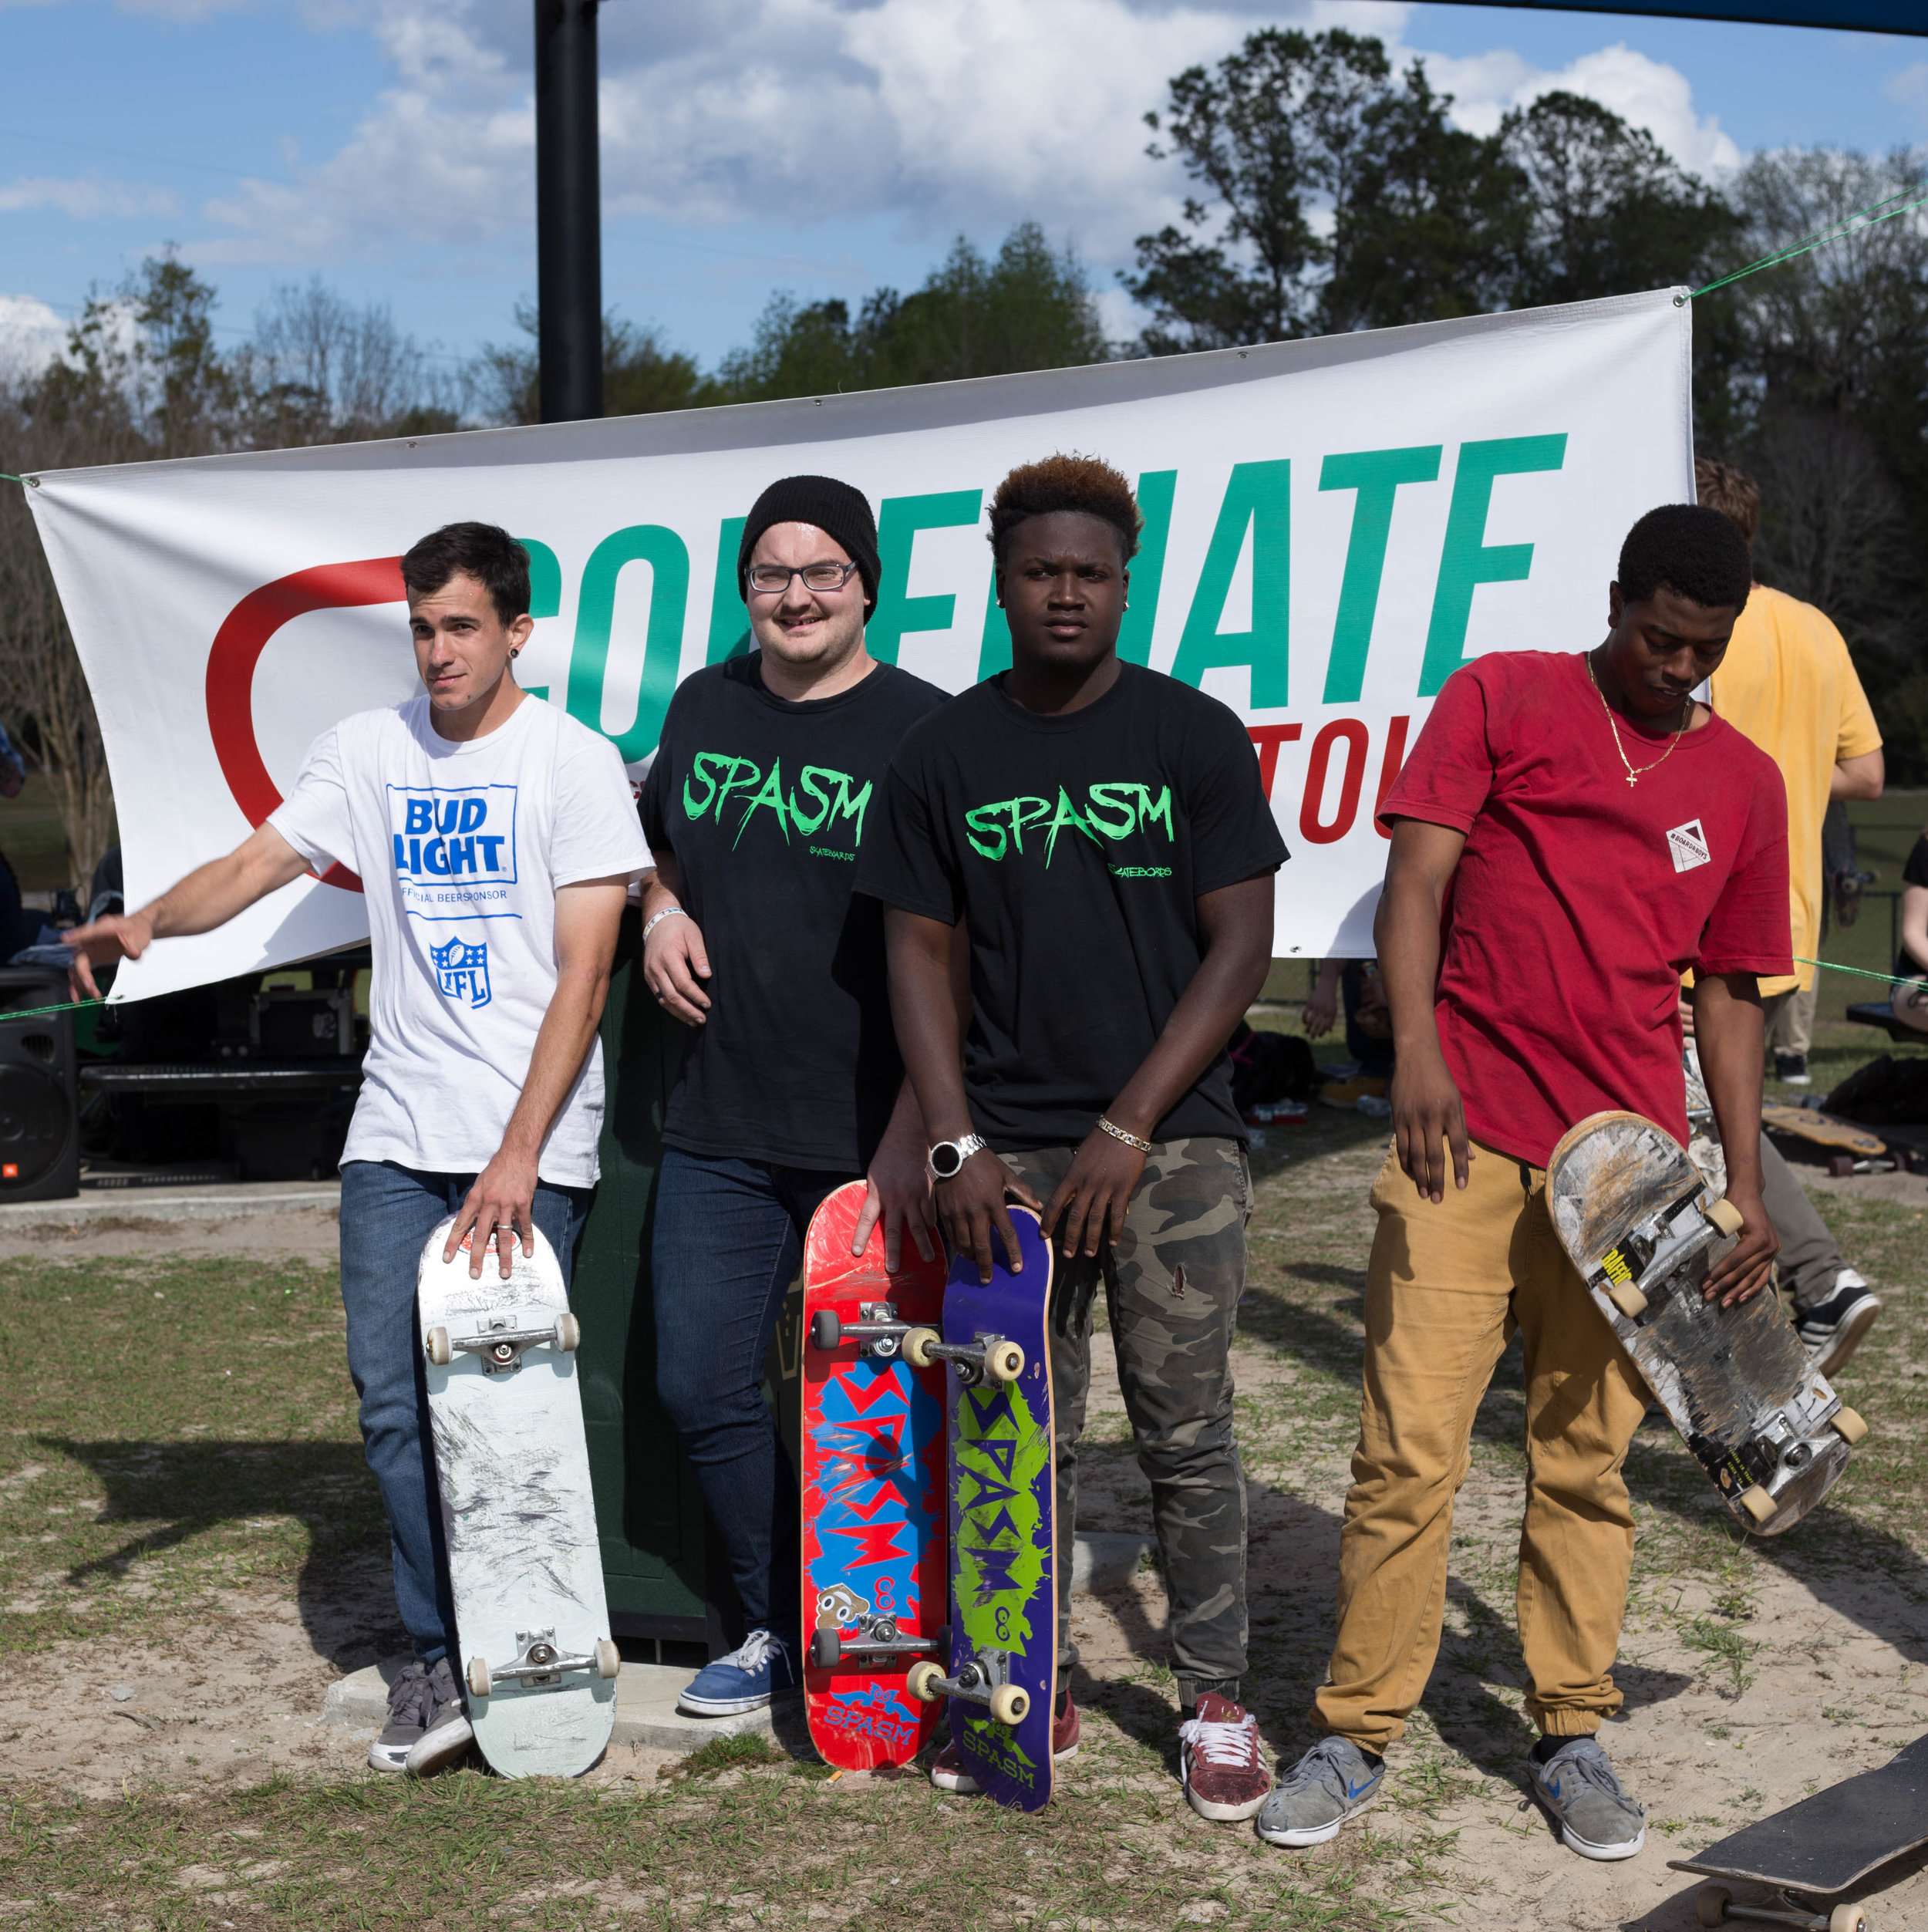 Heat Four. Non-student Division. Spasm Skateboards represent!